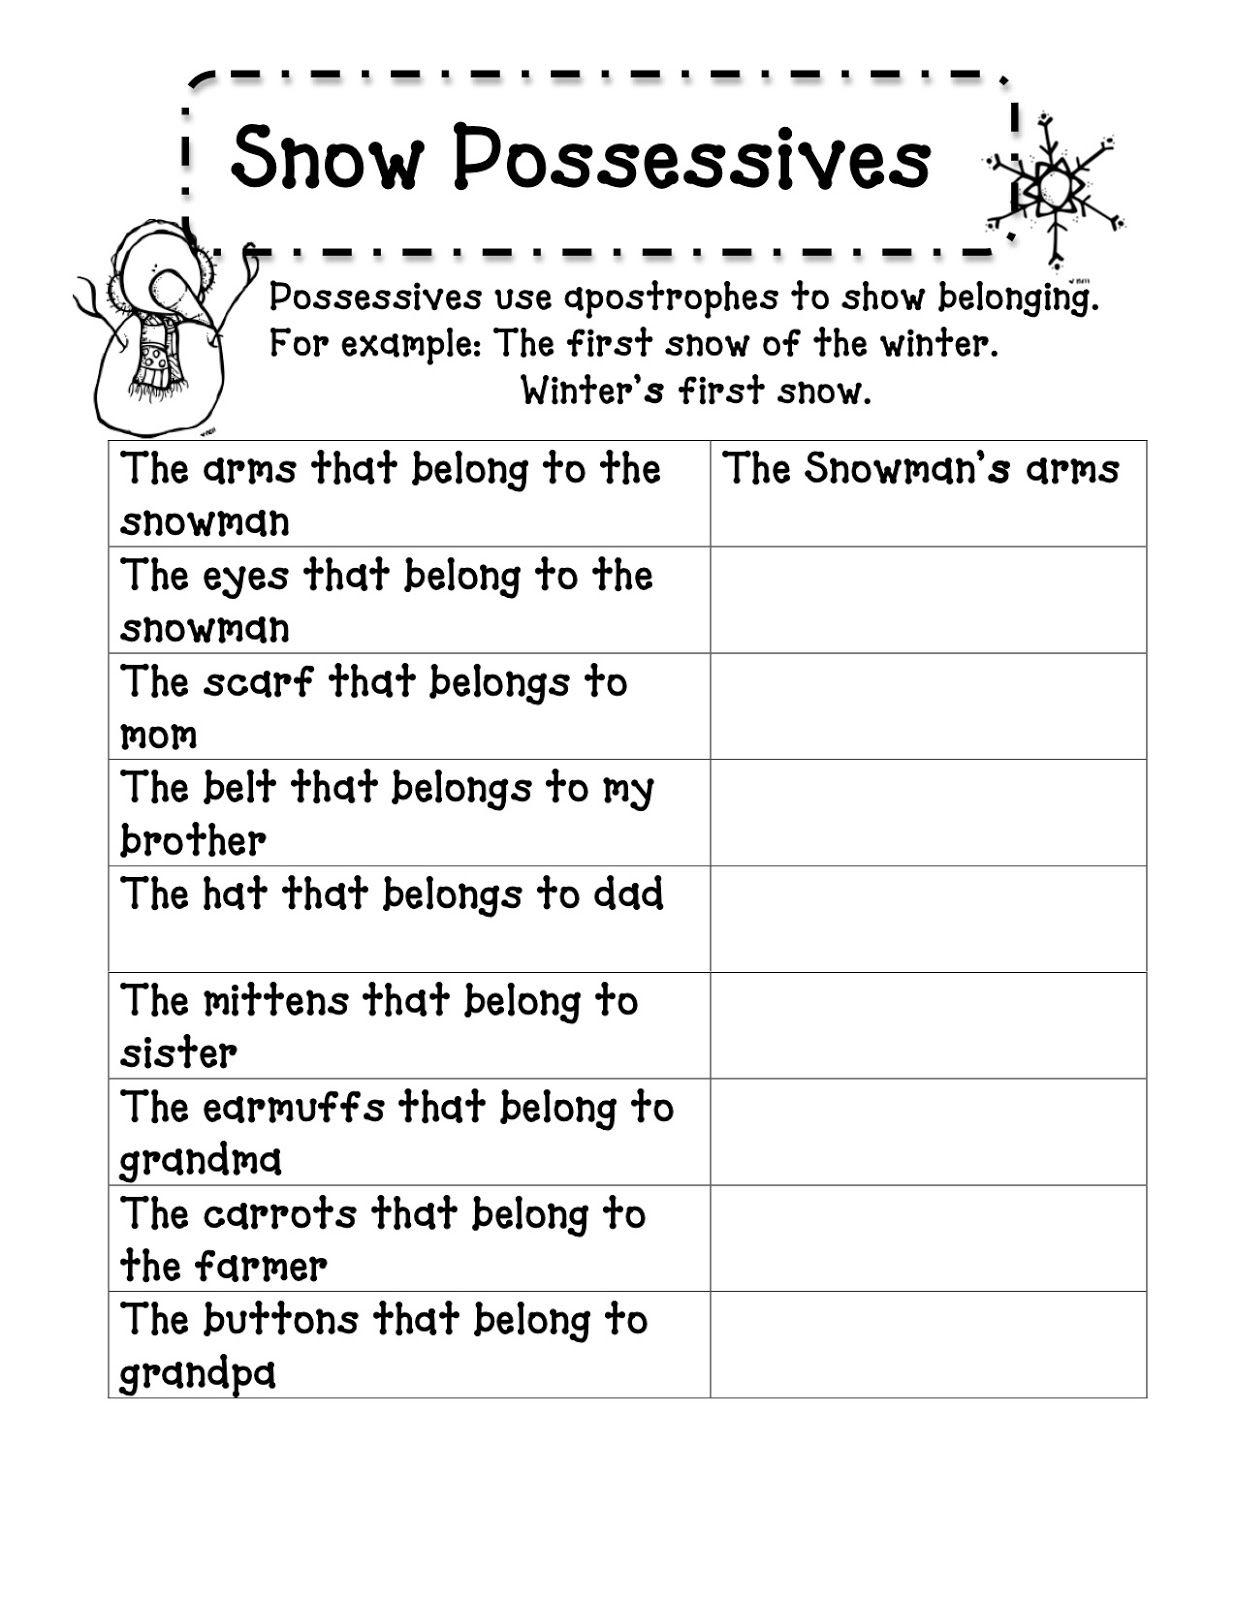 Snowmanpossessivesandpoem Jpg 1 236 1 600 Pixels Possessive Nouns Worksheets Possessive Nouns Nouns Worksheet